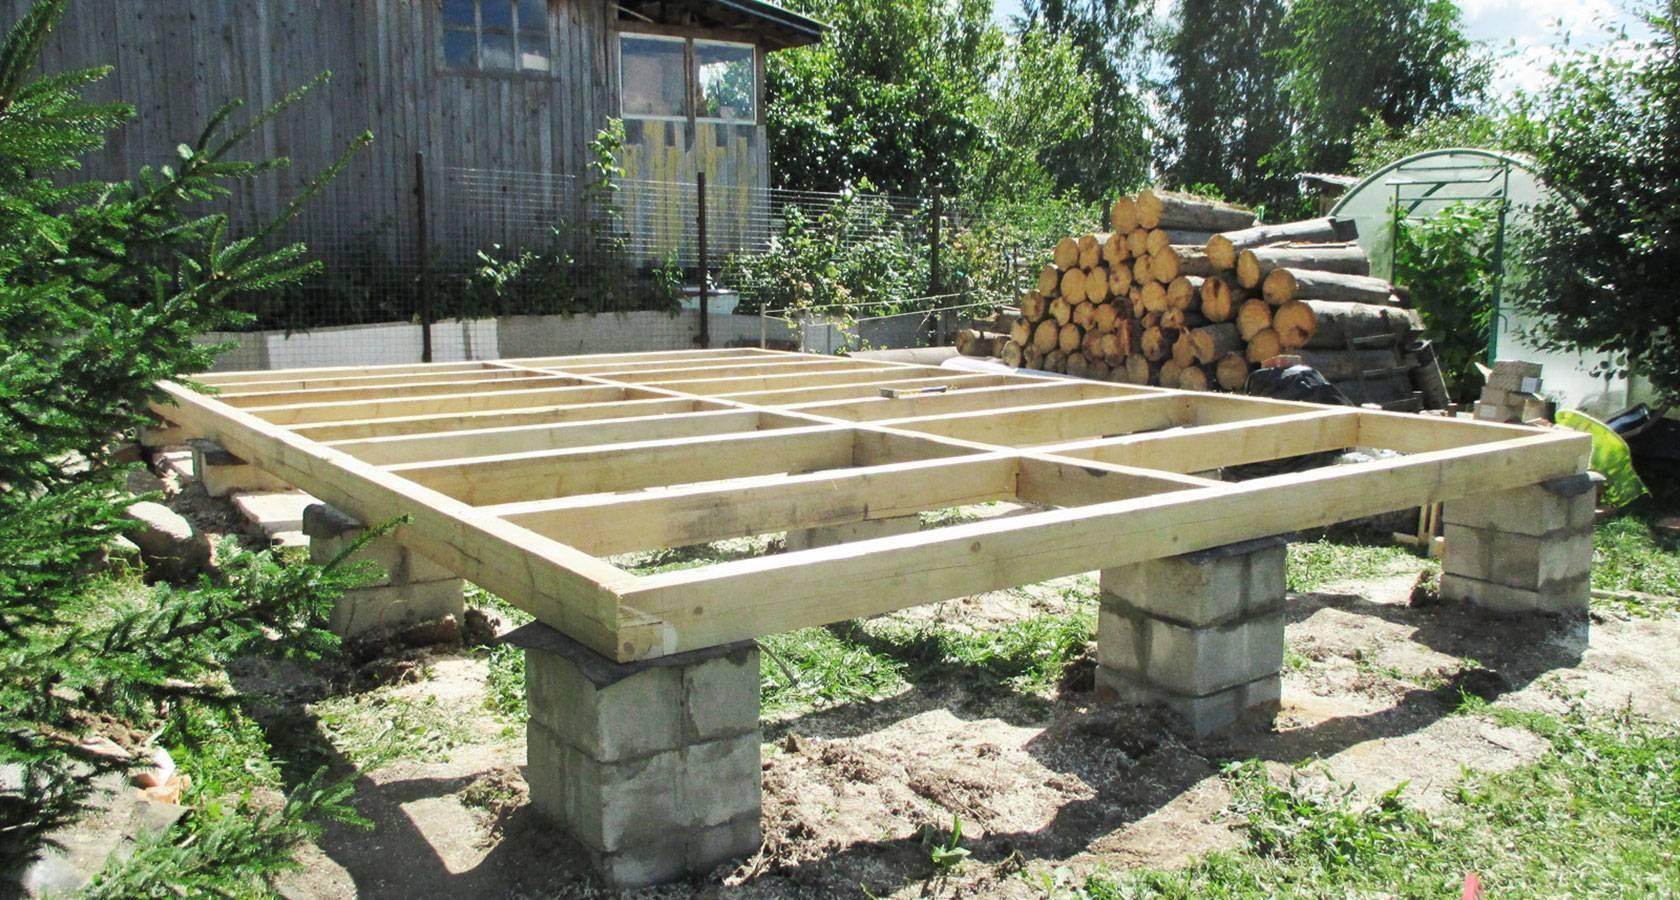 Монтаж столбчатого фундамента для гаража и преимущества